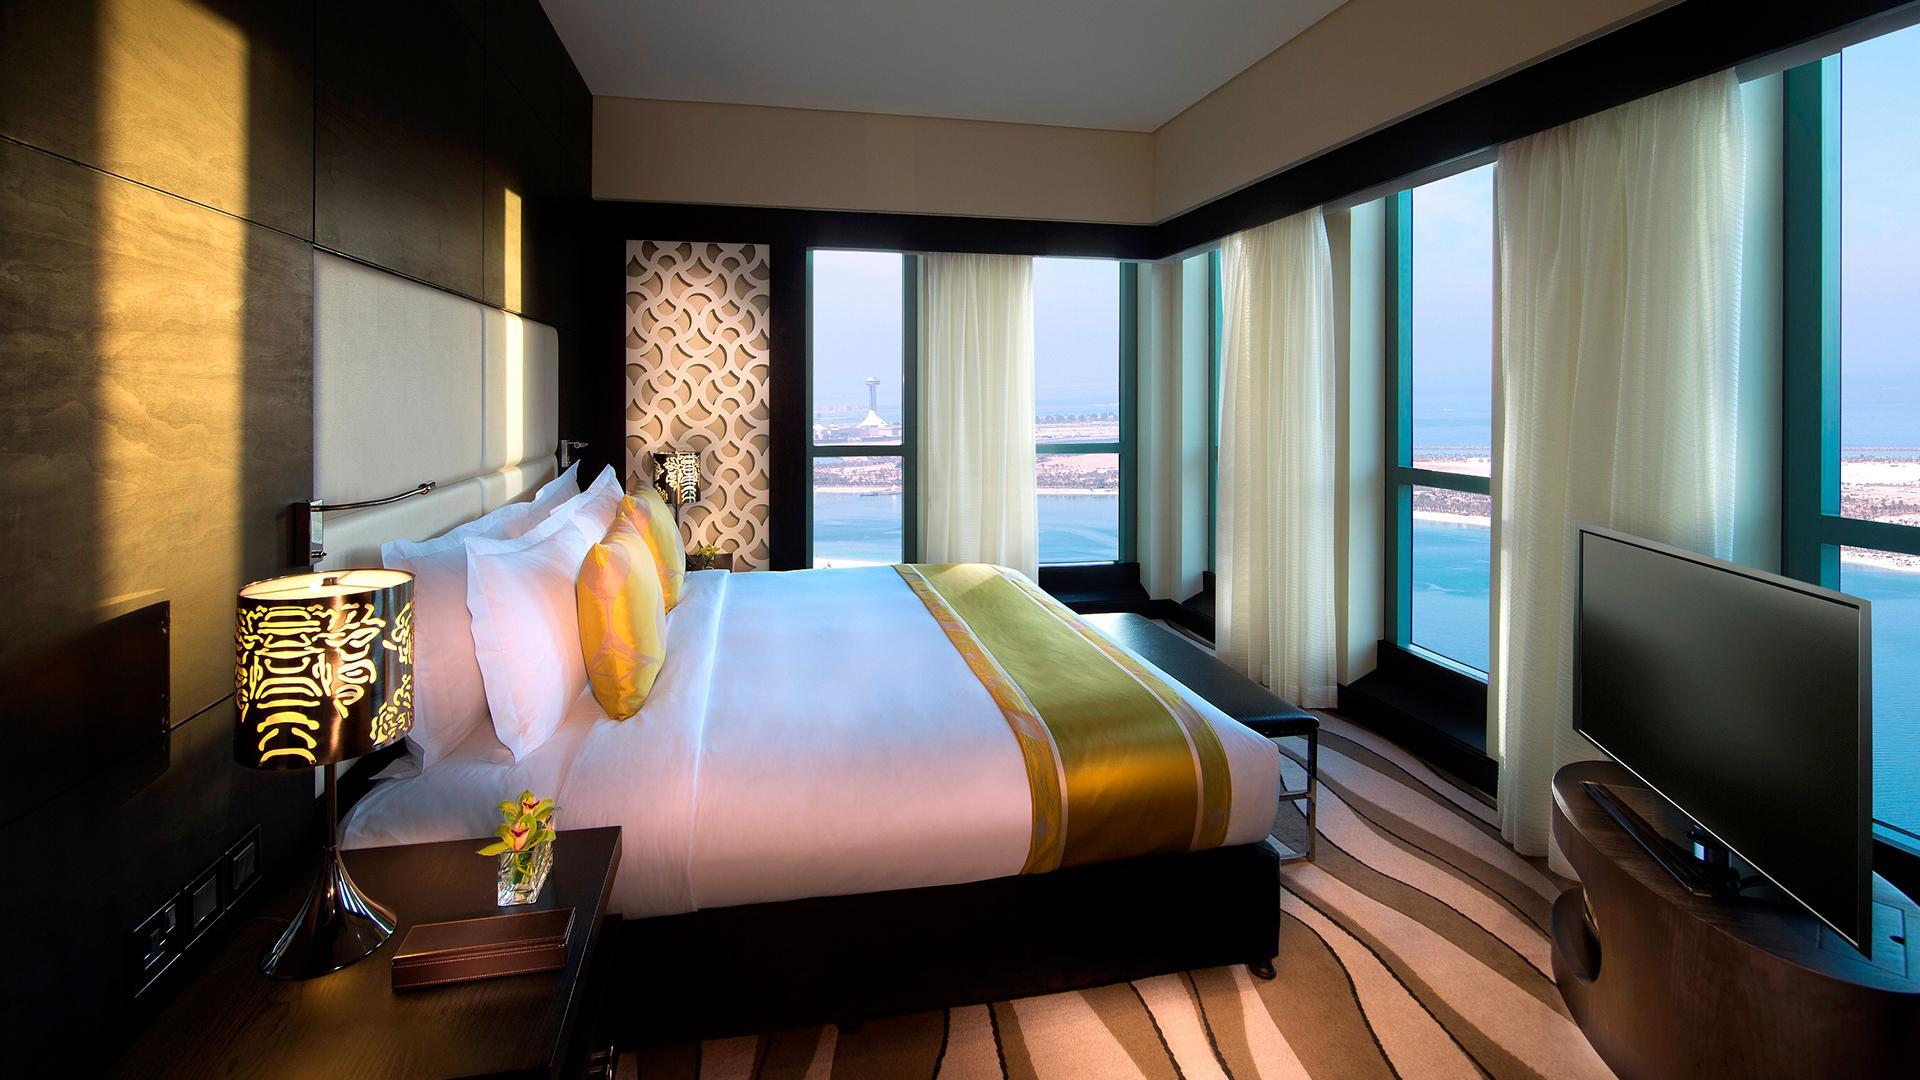 Prestige Suite image 1 at Sofitel Abu Dhabi Corniche by null, Abu Dhabi, United Arab Emirates